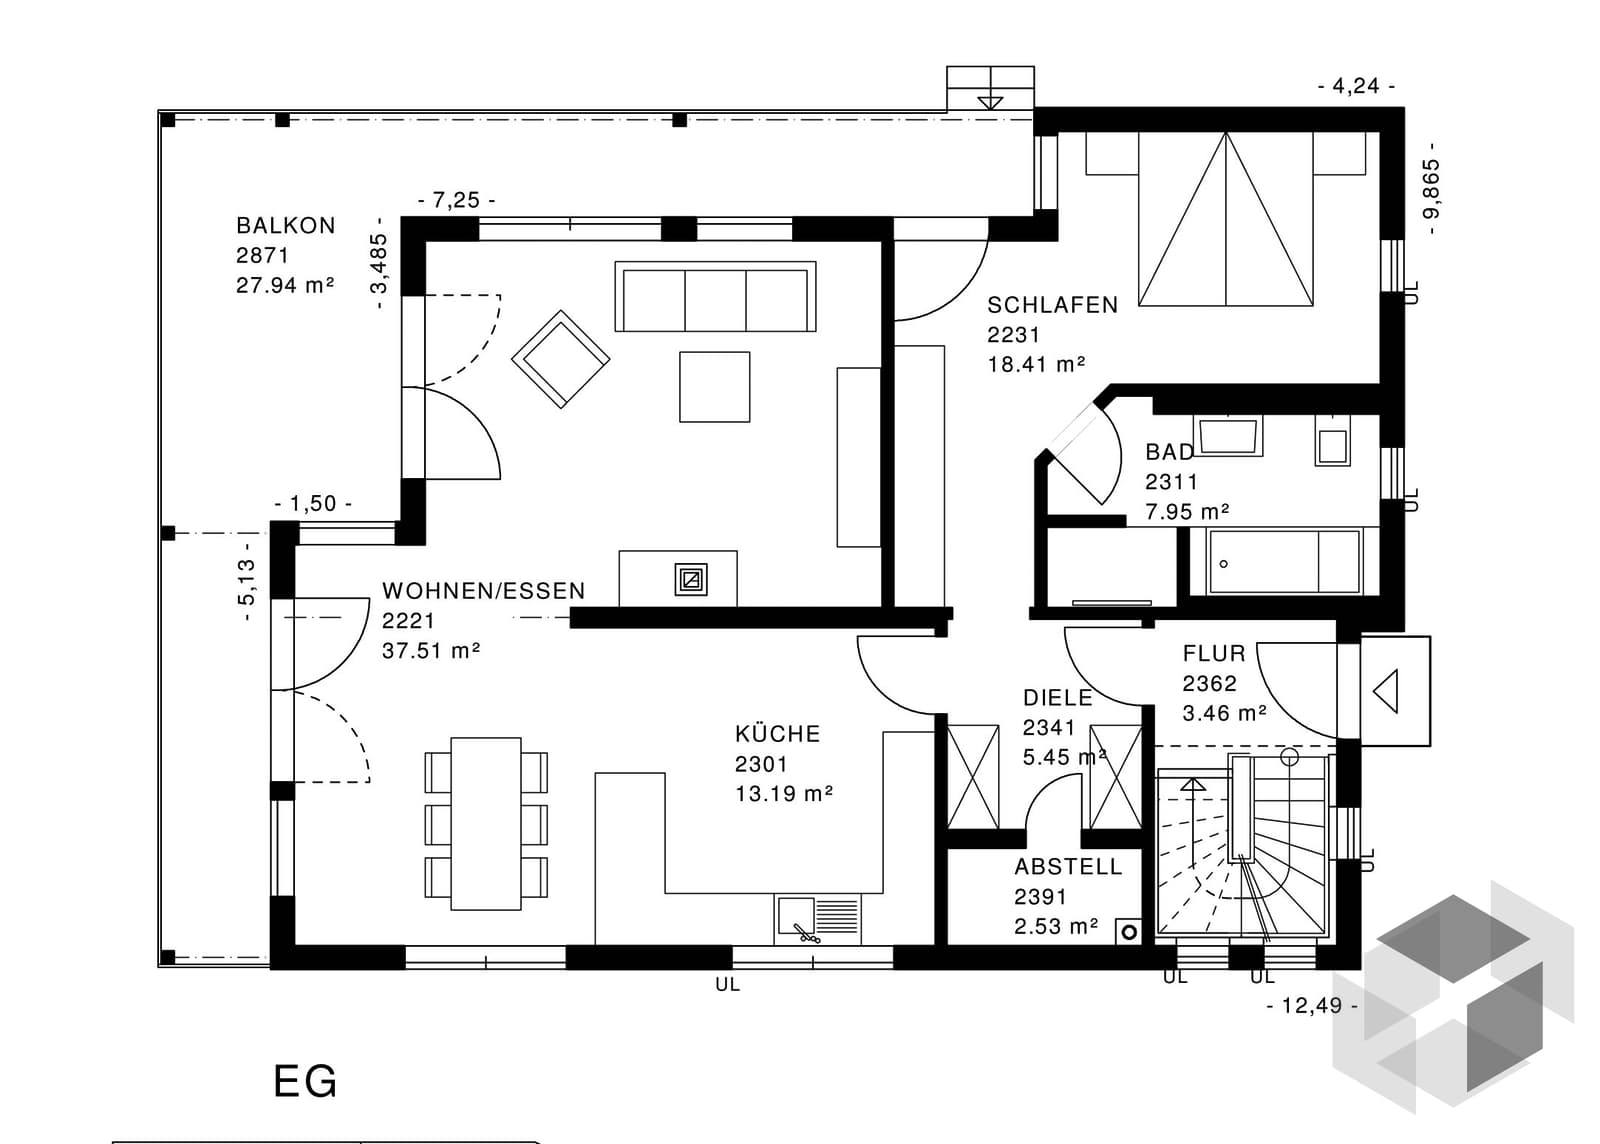 haacke natur inactive von haacke haus komplette daten bersicht. Black Bedroom Furniture Sets. Home Design Ideas